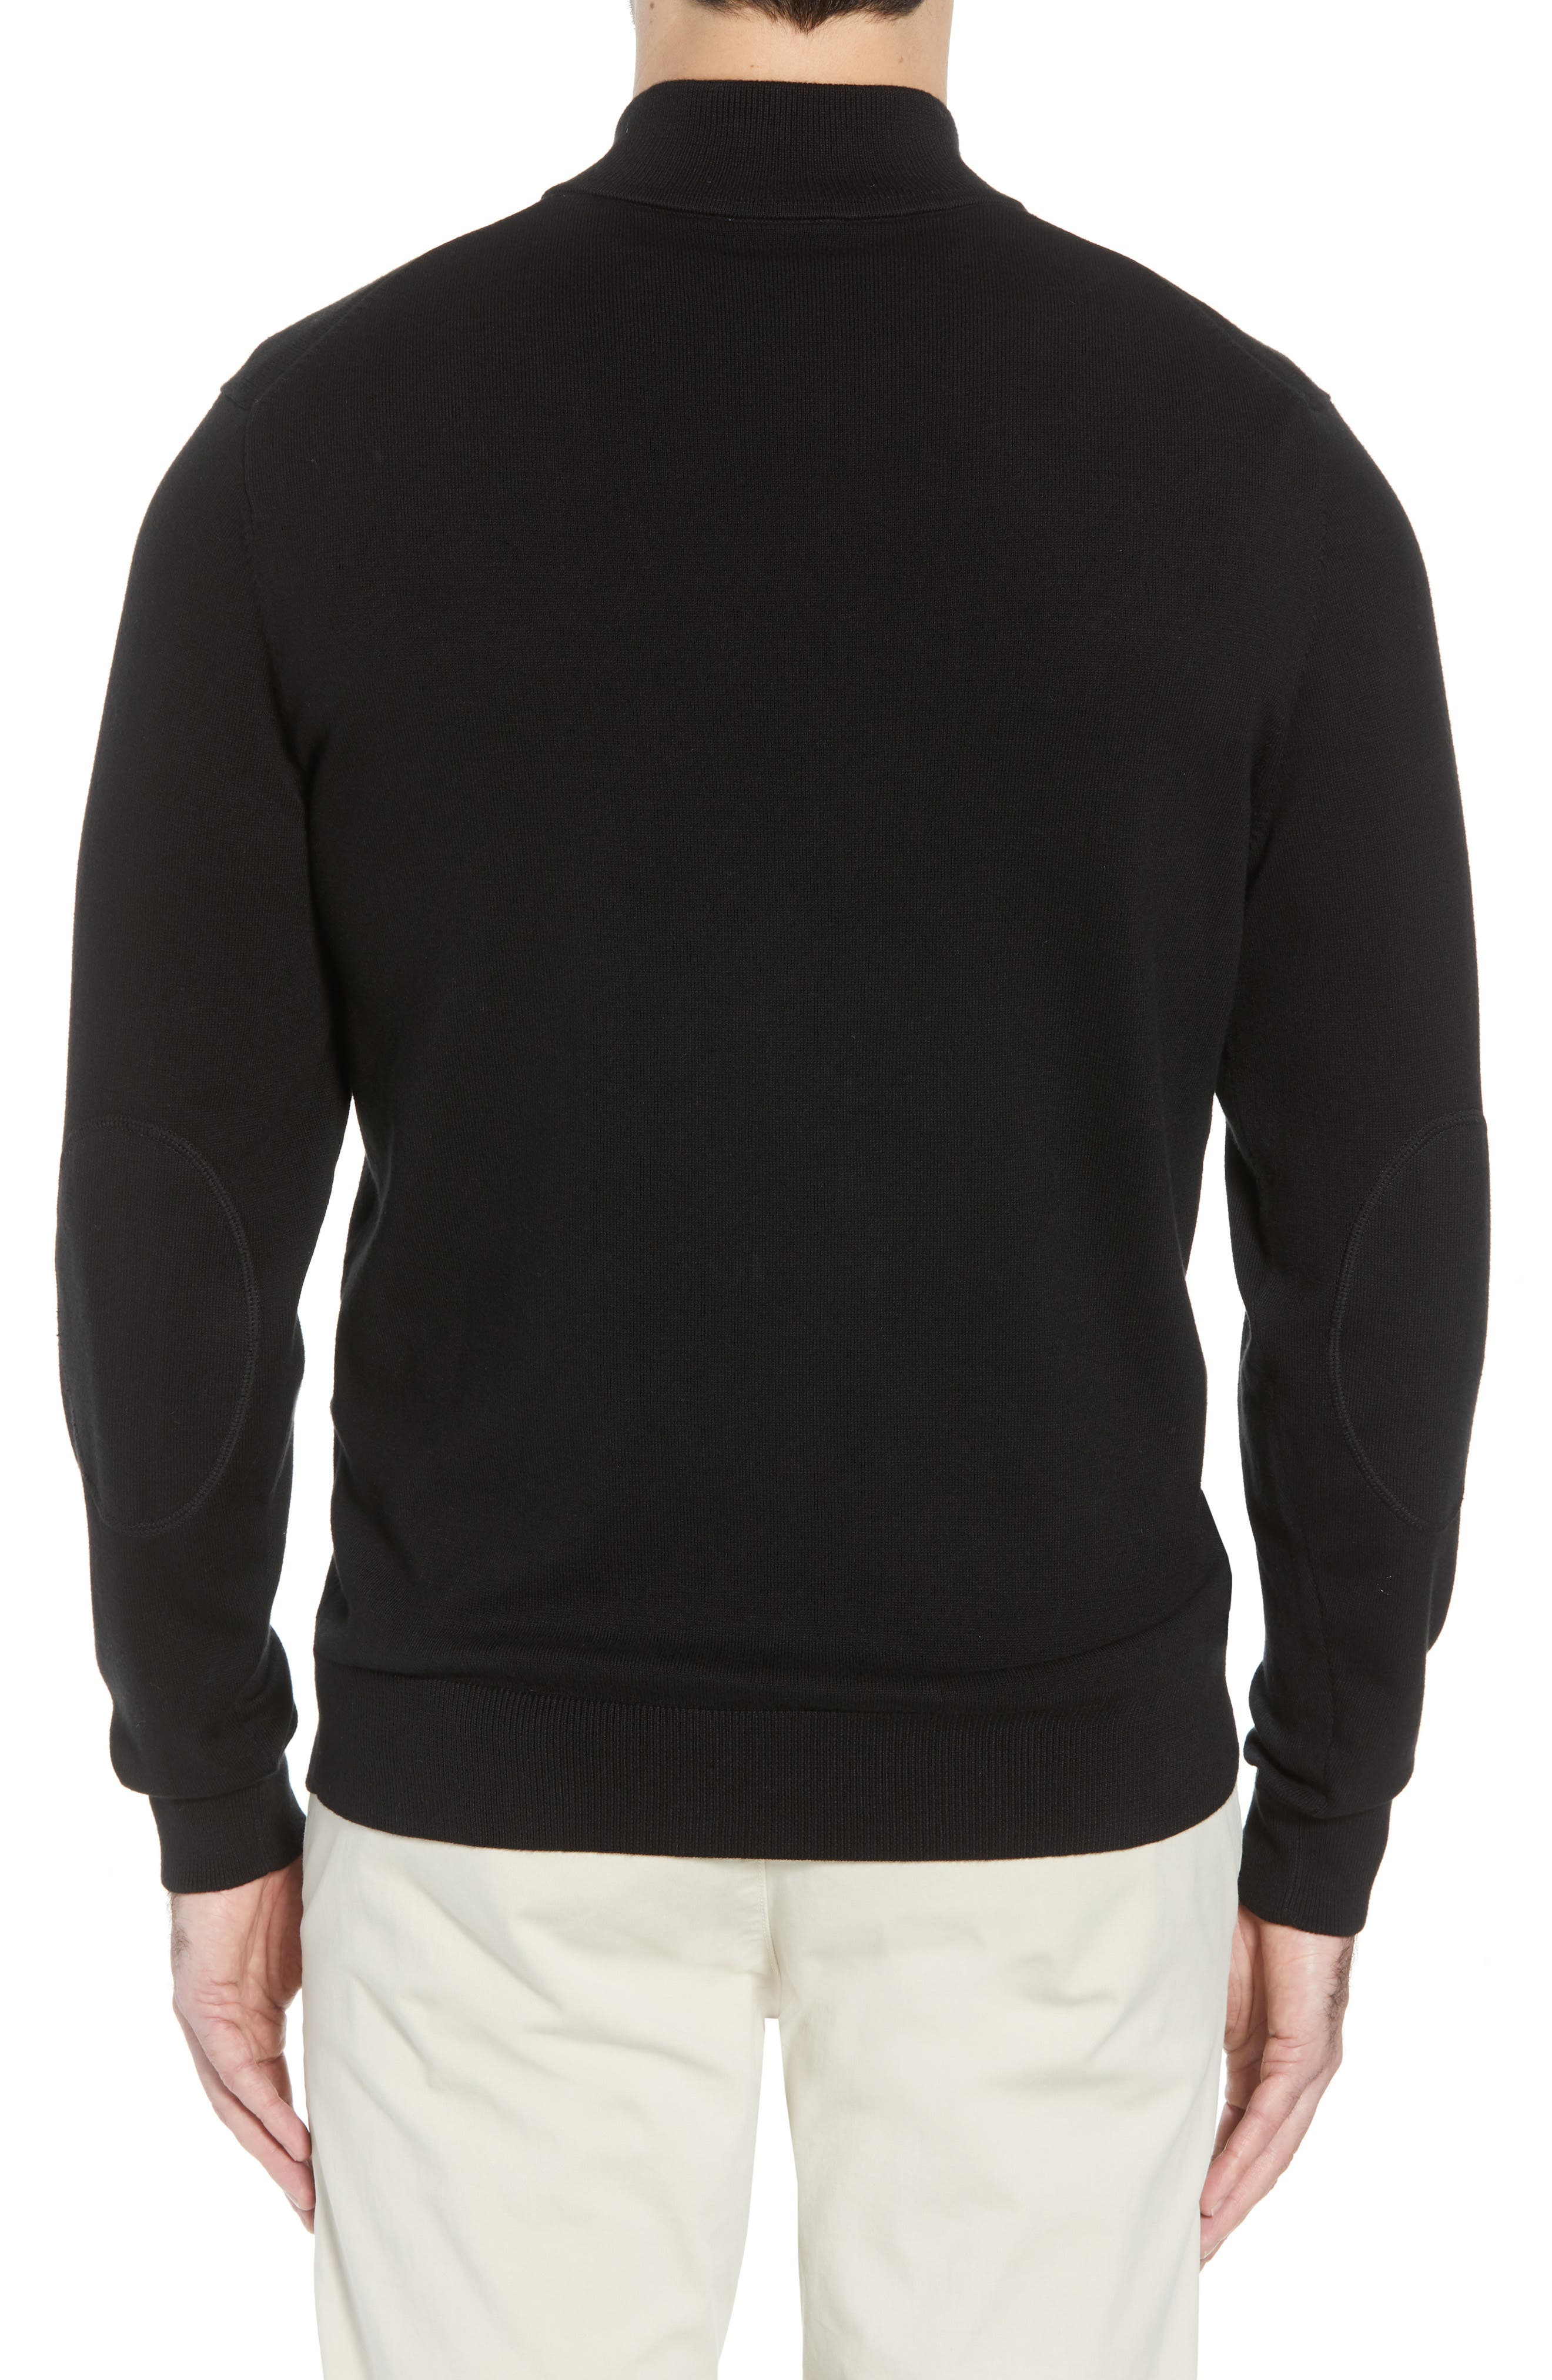 Cincinnati Bengals - Lakemont Regular Fit Quarter Zip Sweater,                             Alternate thumbnail 2, color,                             001